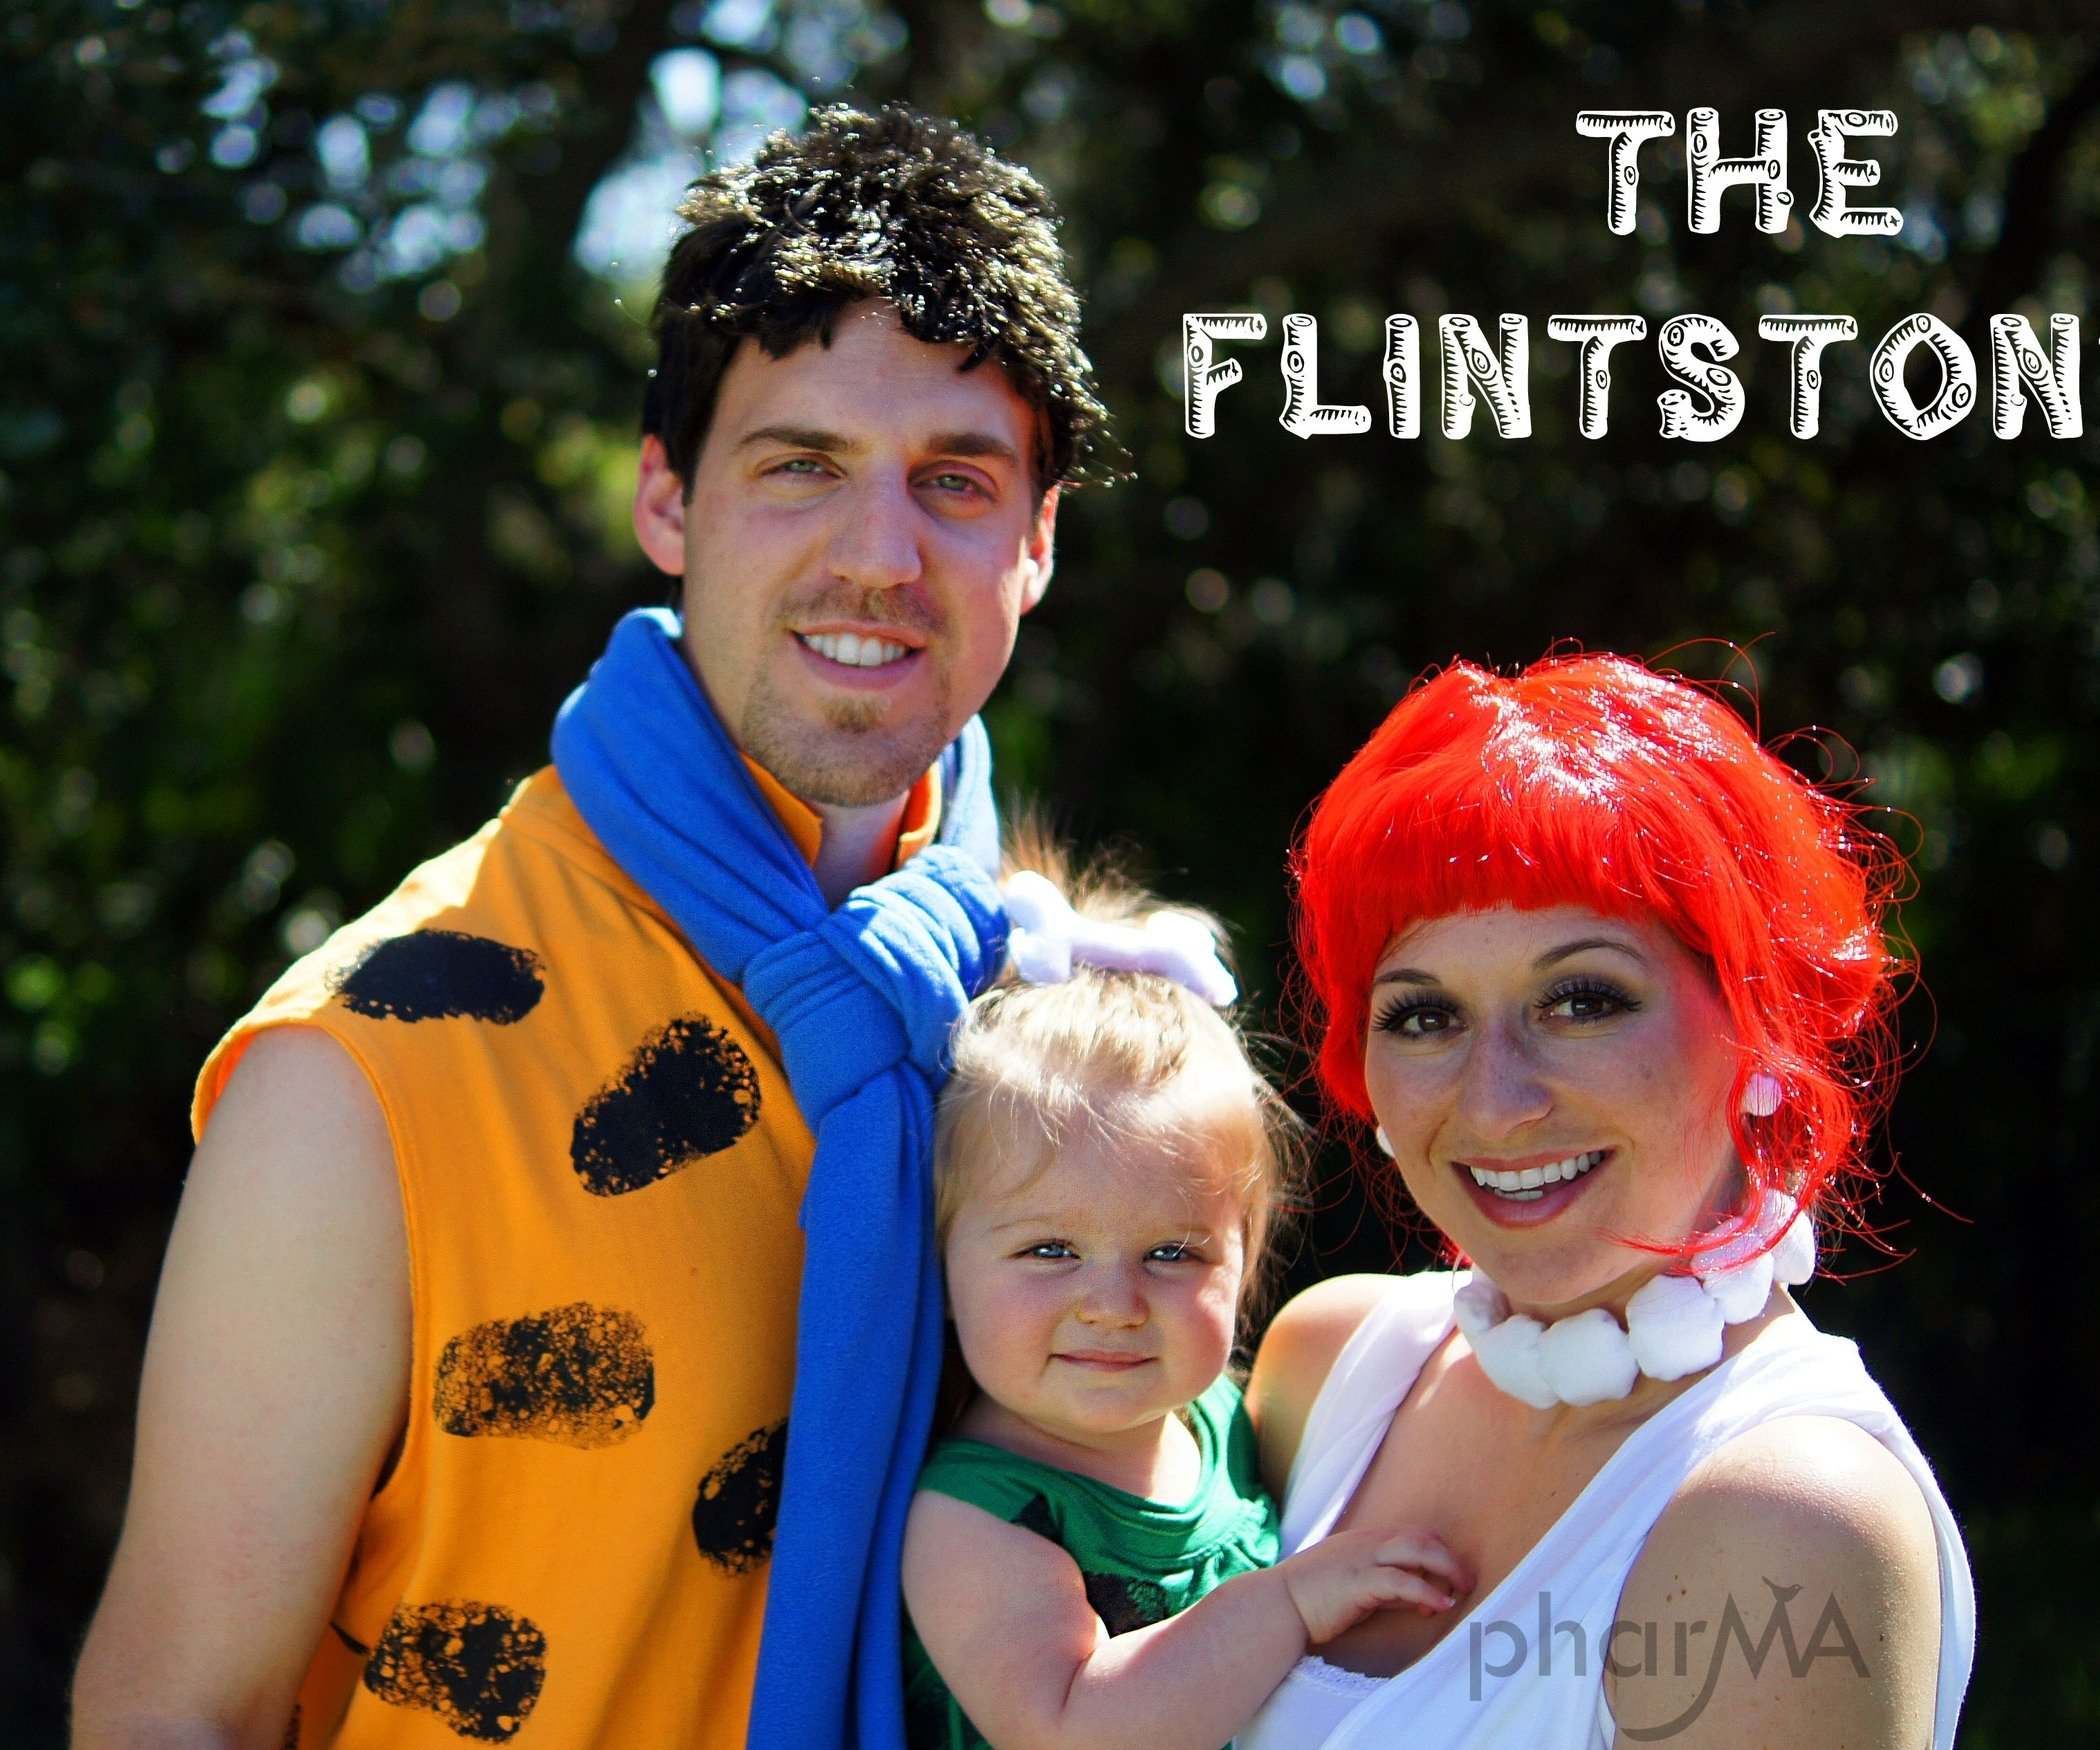 10 Fantastic Family Of 3 Halloween Costume Ideas flintstones family halloween costumes 1 2020